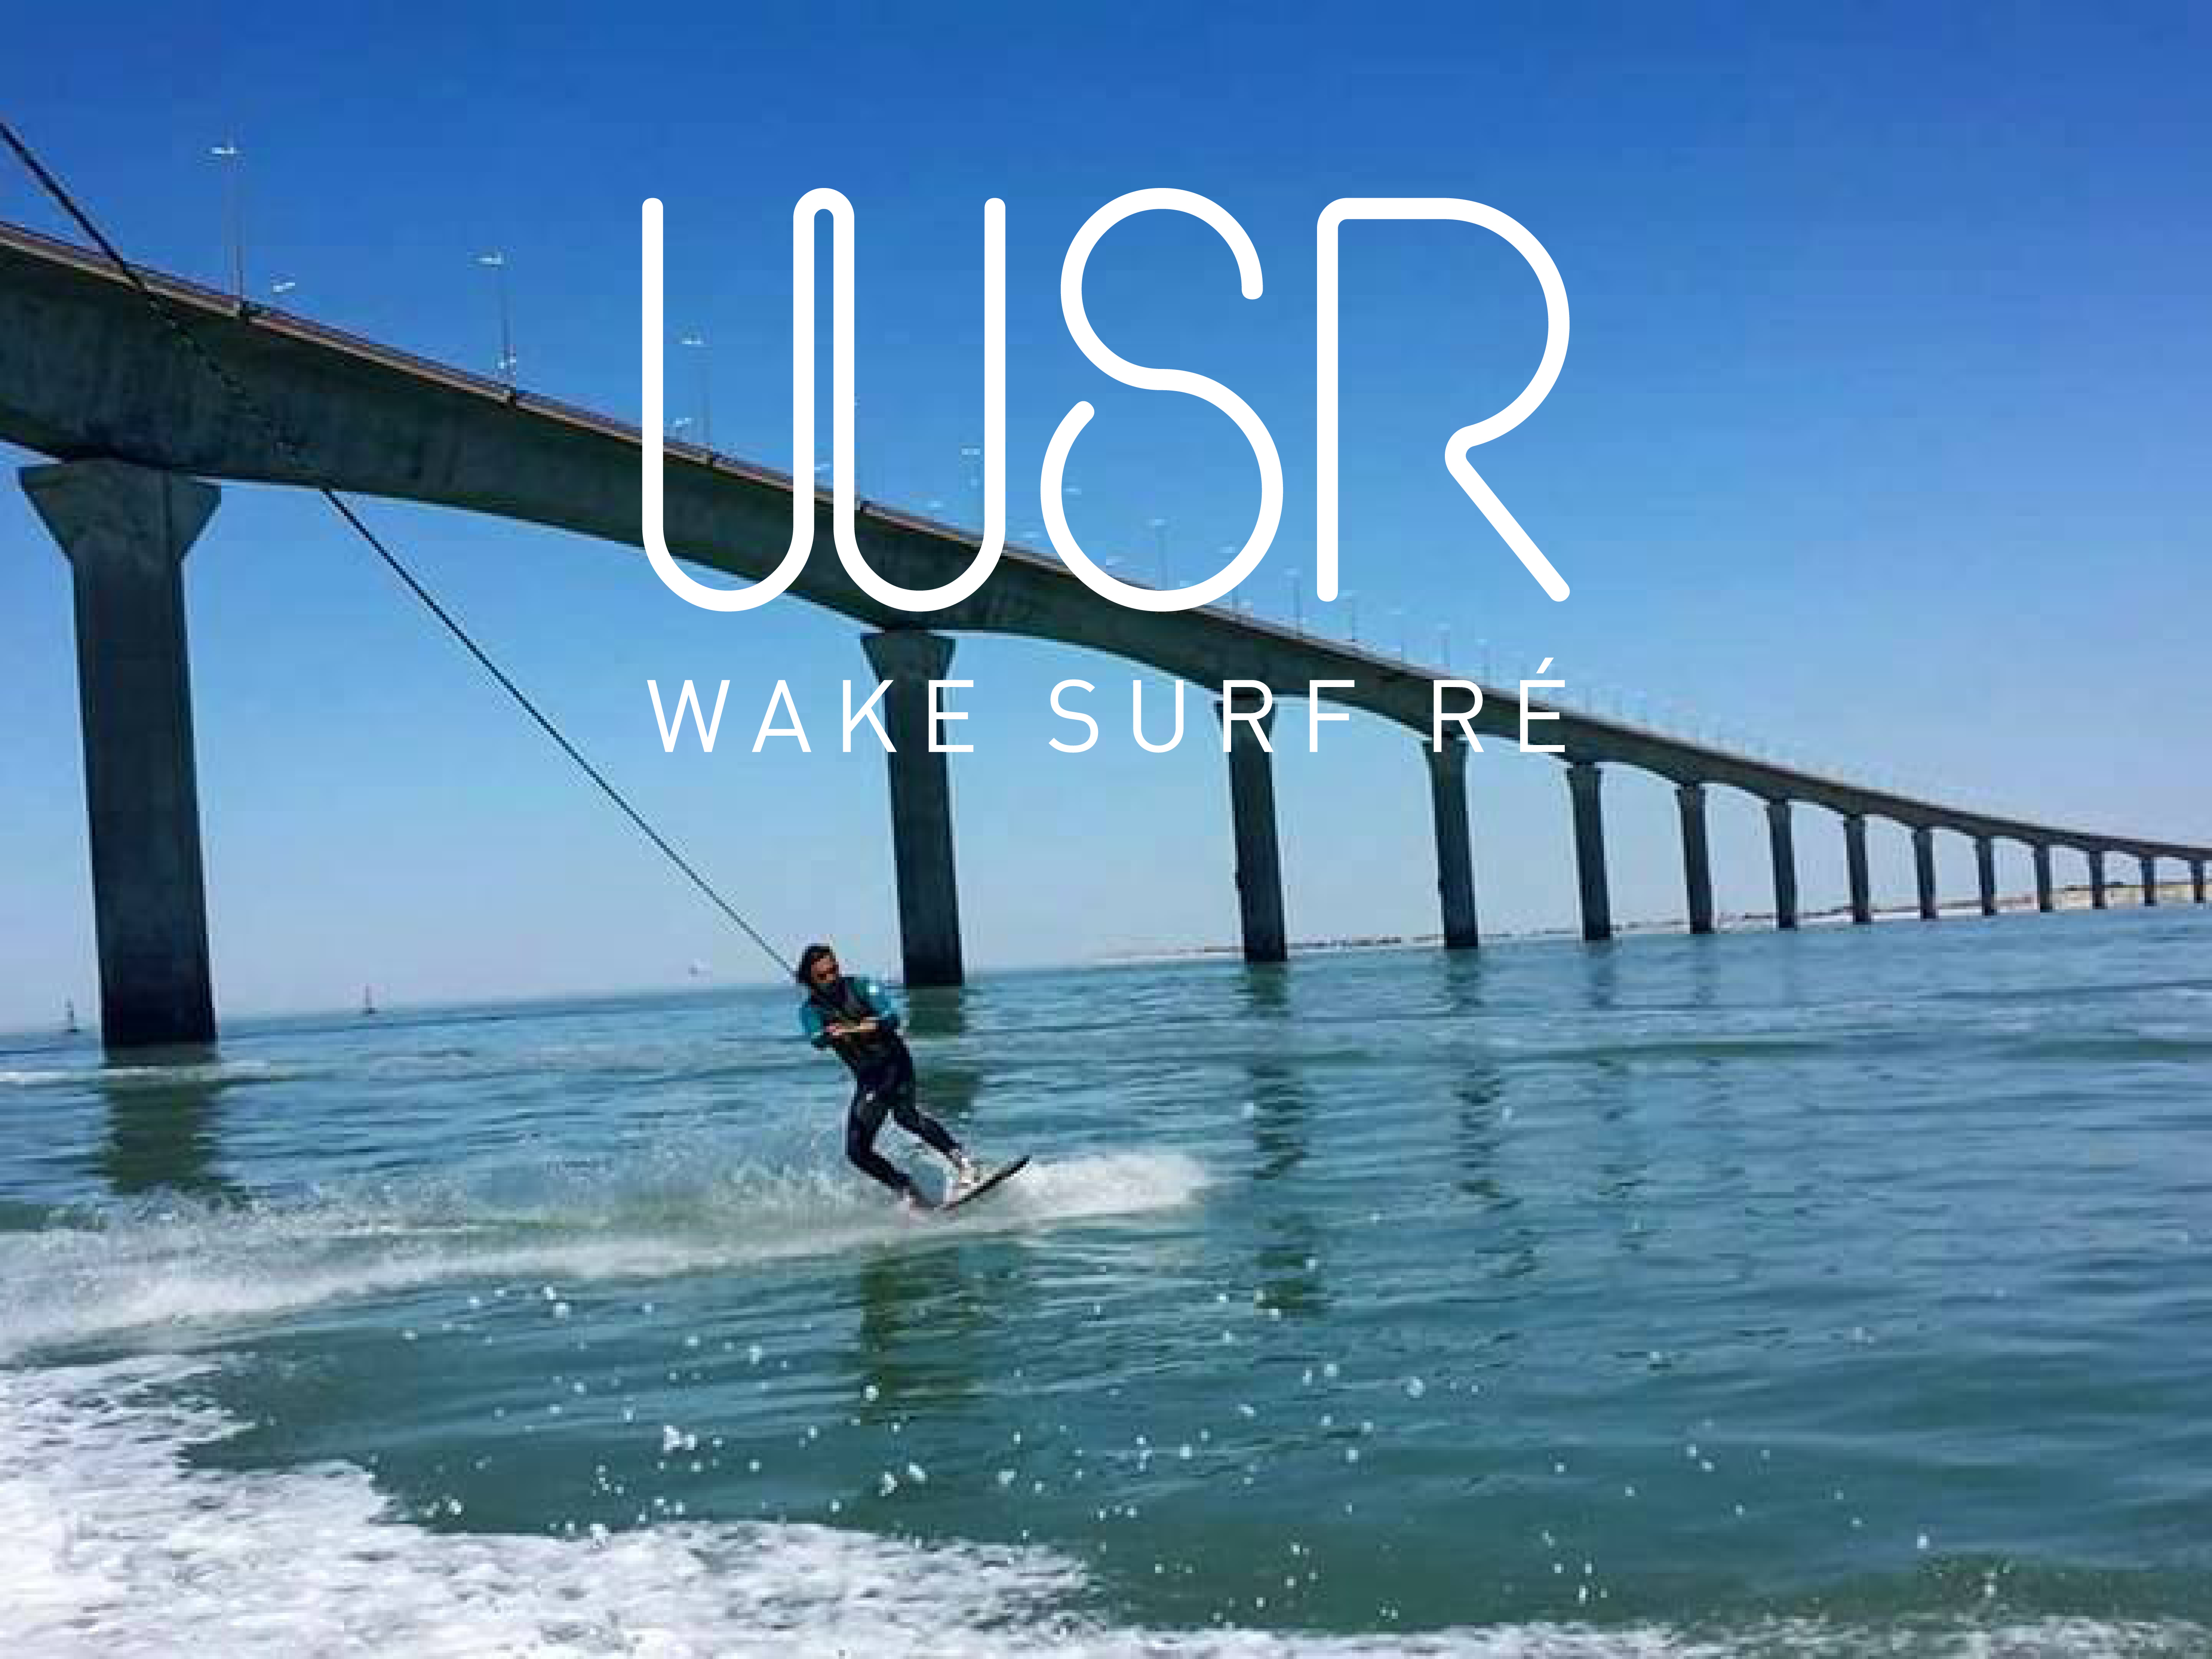 wake surf re